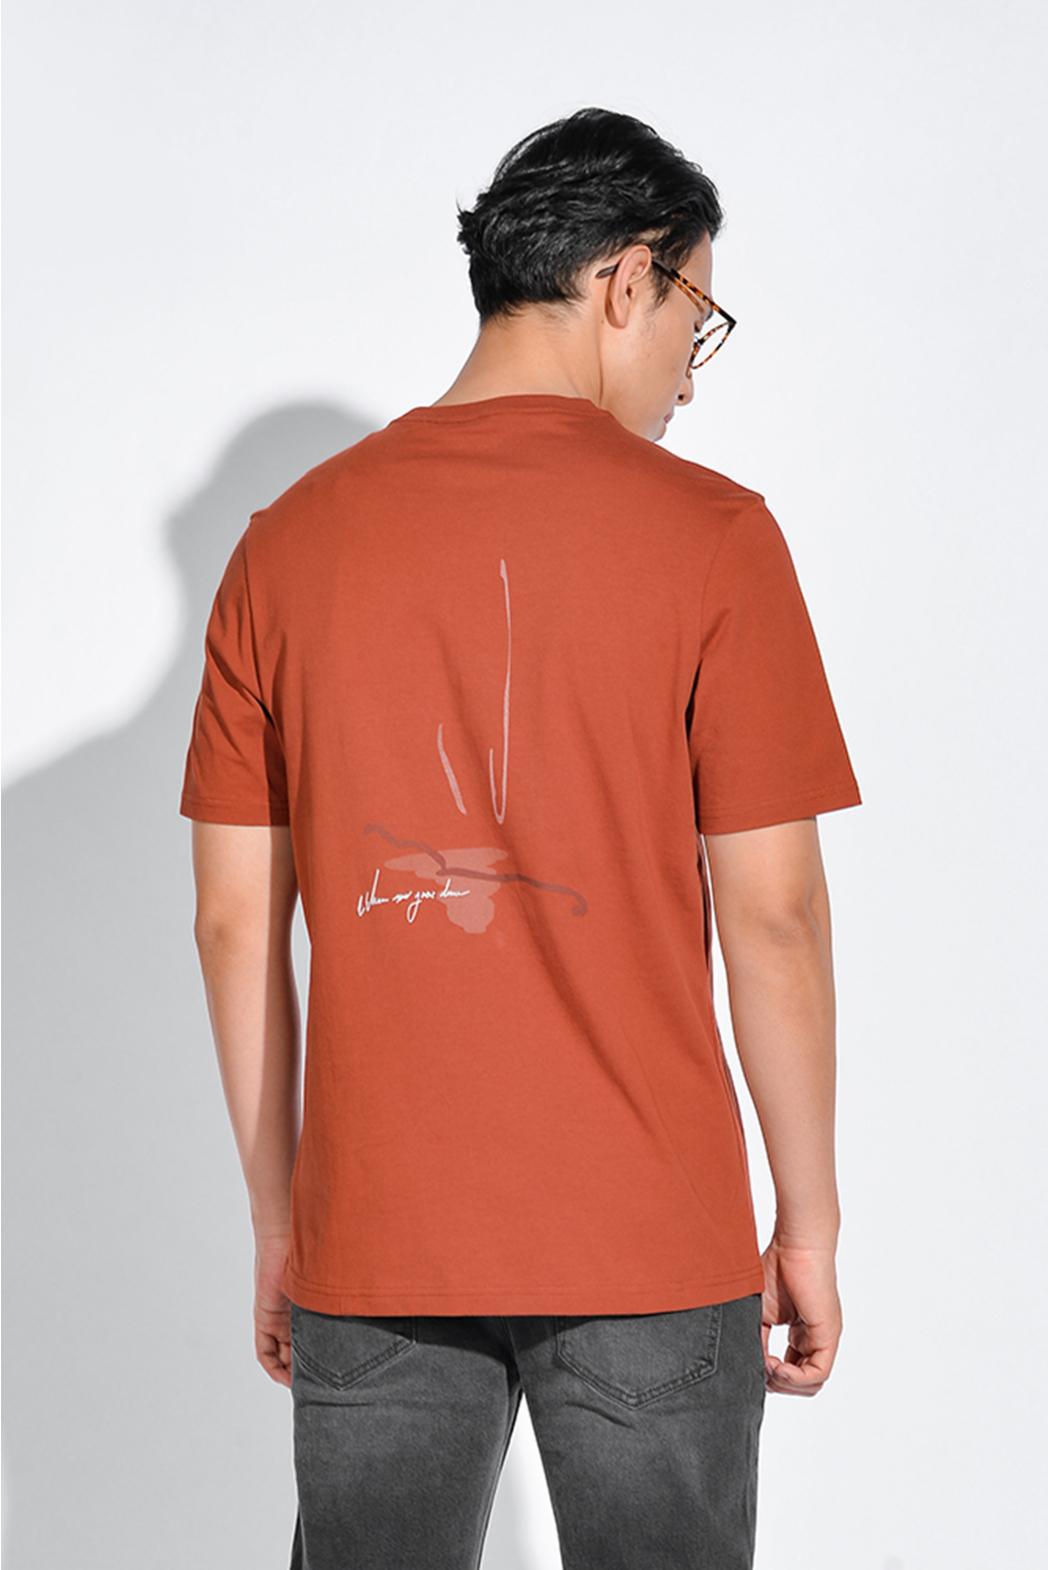 Áo thun PRINT. Cotton. REGULAR form - 10S20TSH028